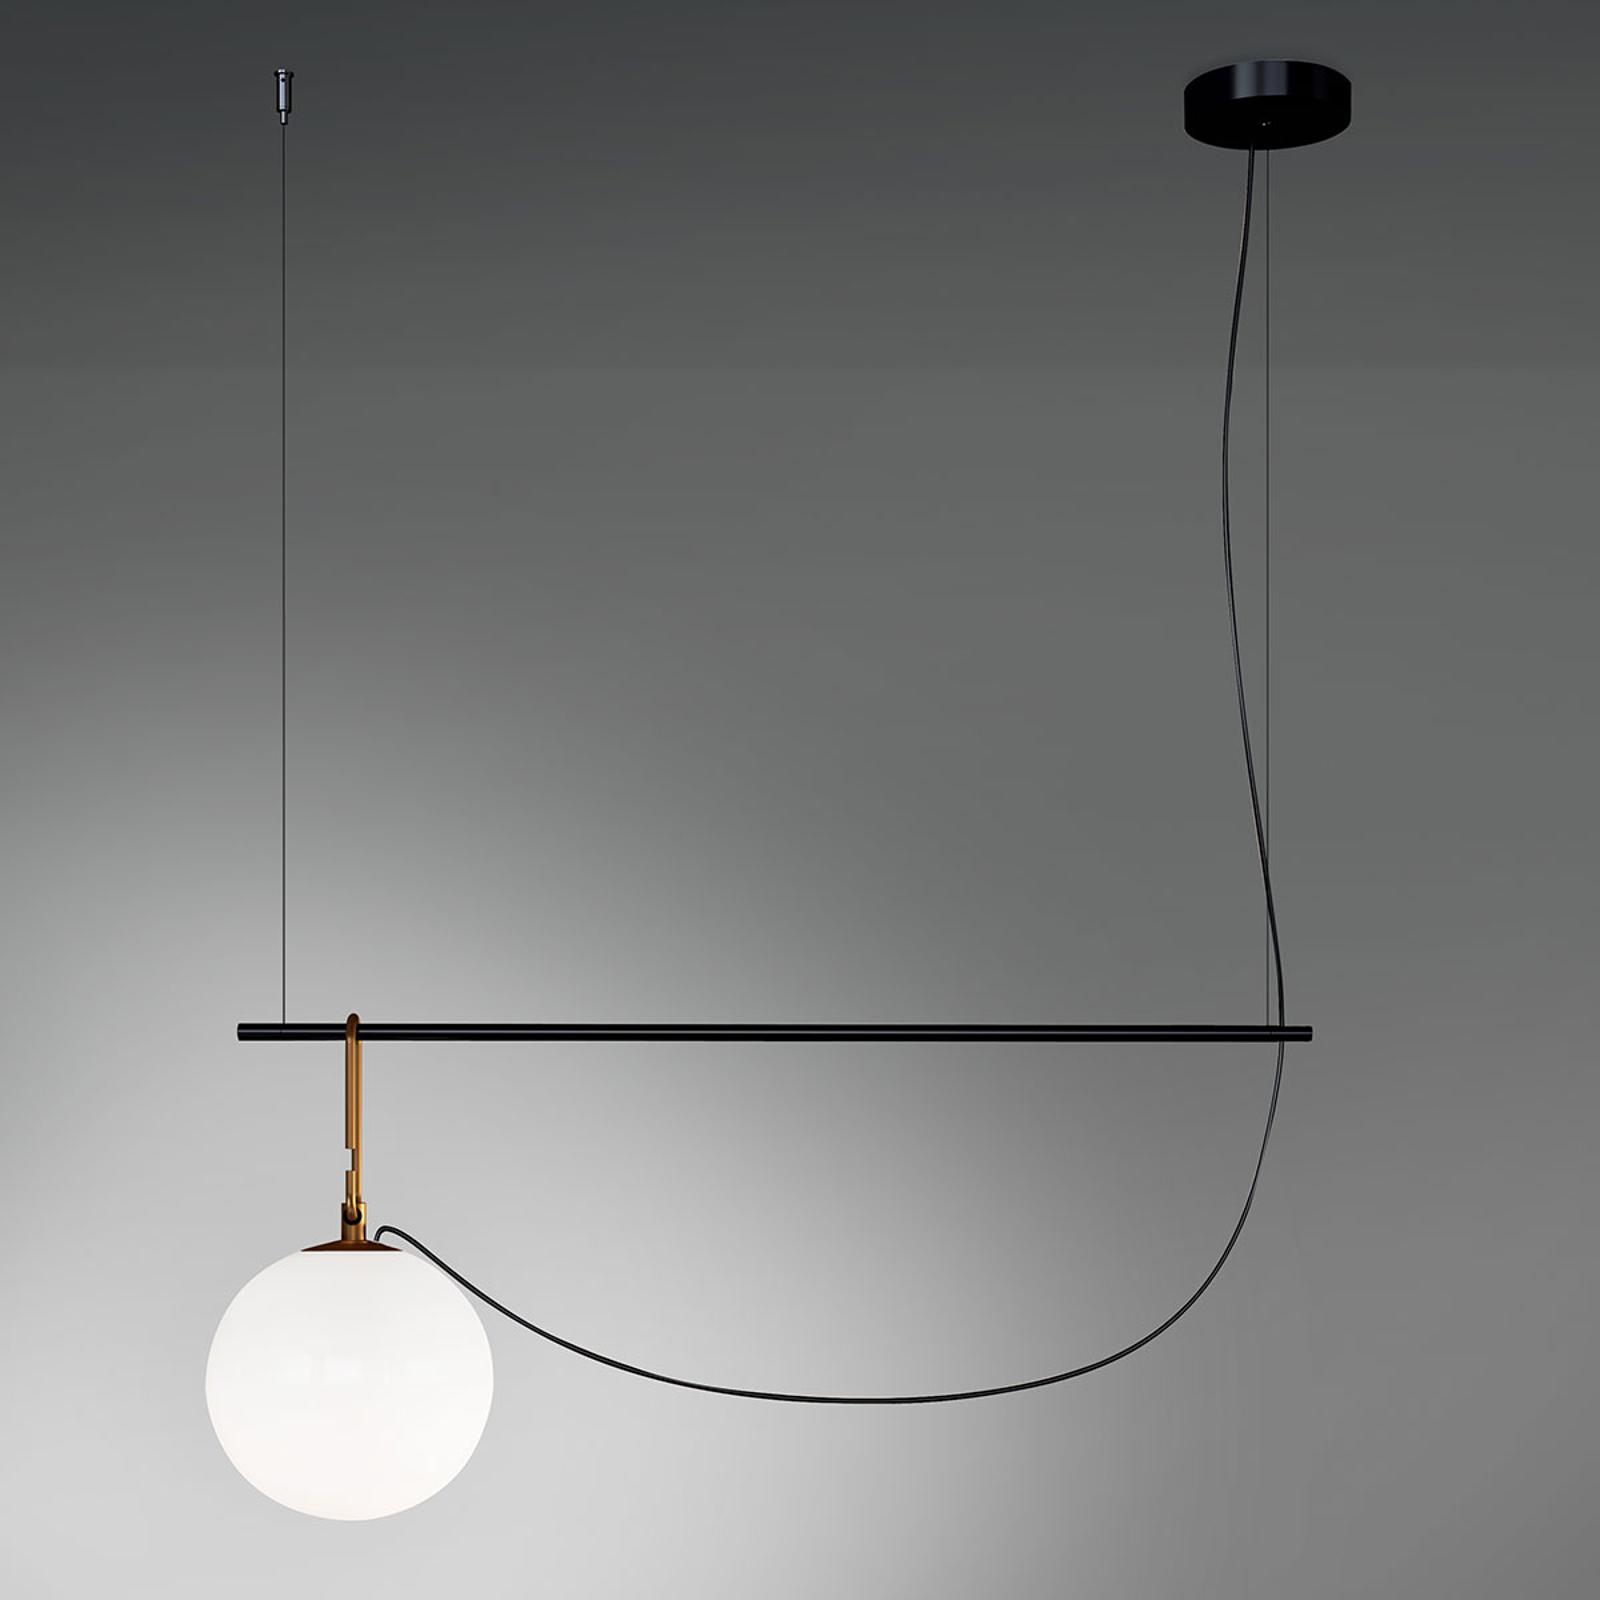 Artemide nh S2 22 lampa wisząca 90,5 cm kula Ø22cm